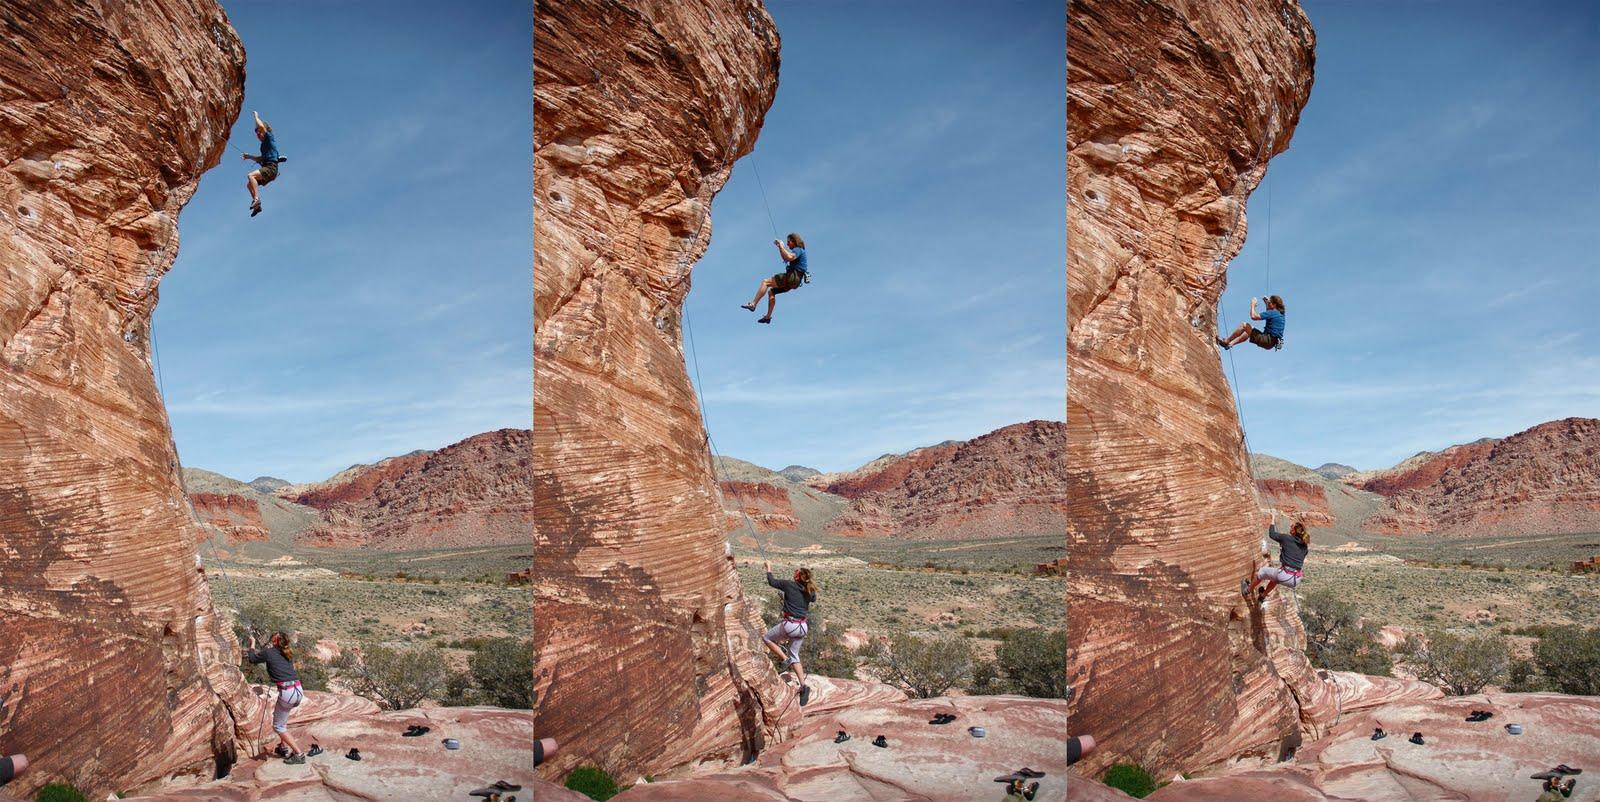 FallingComboPhotoClass